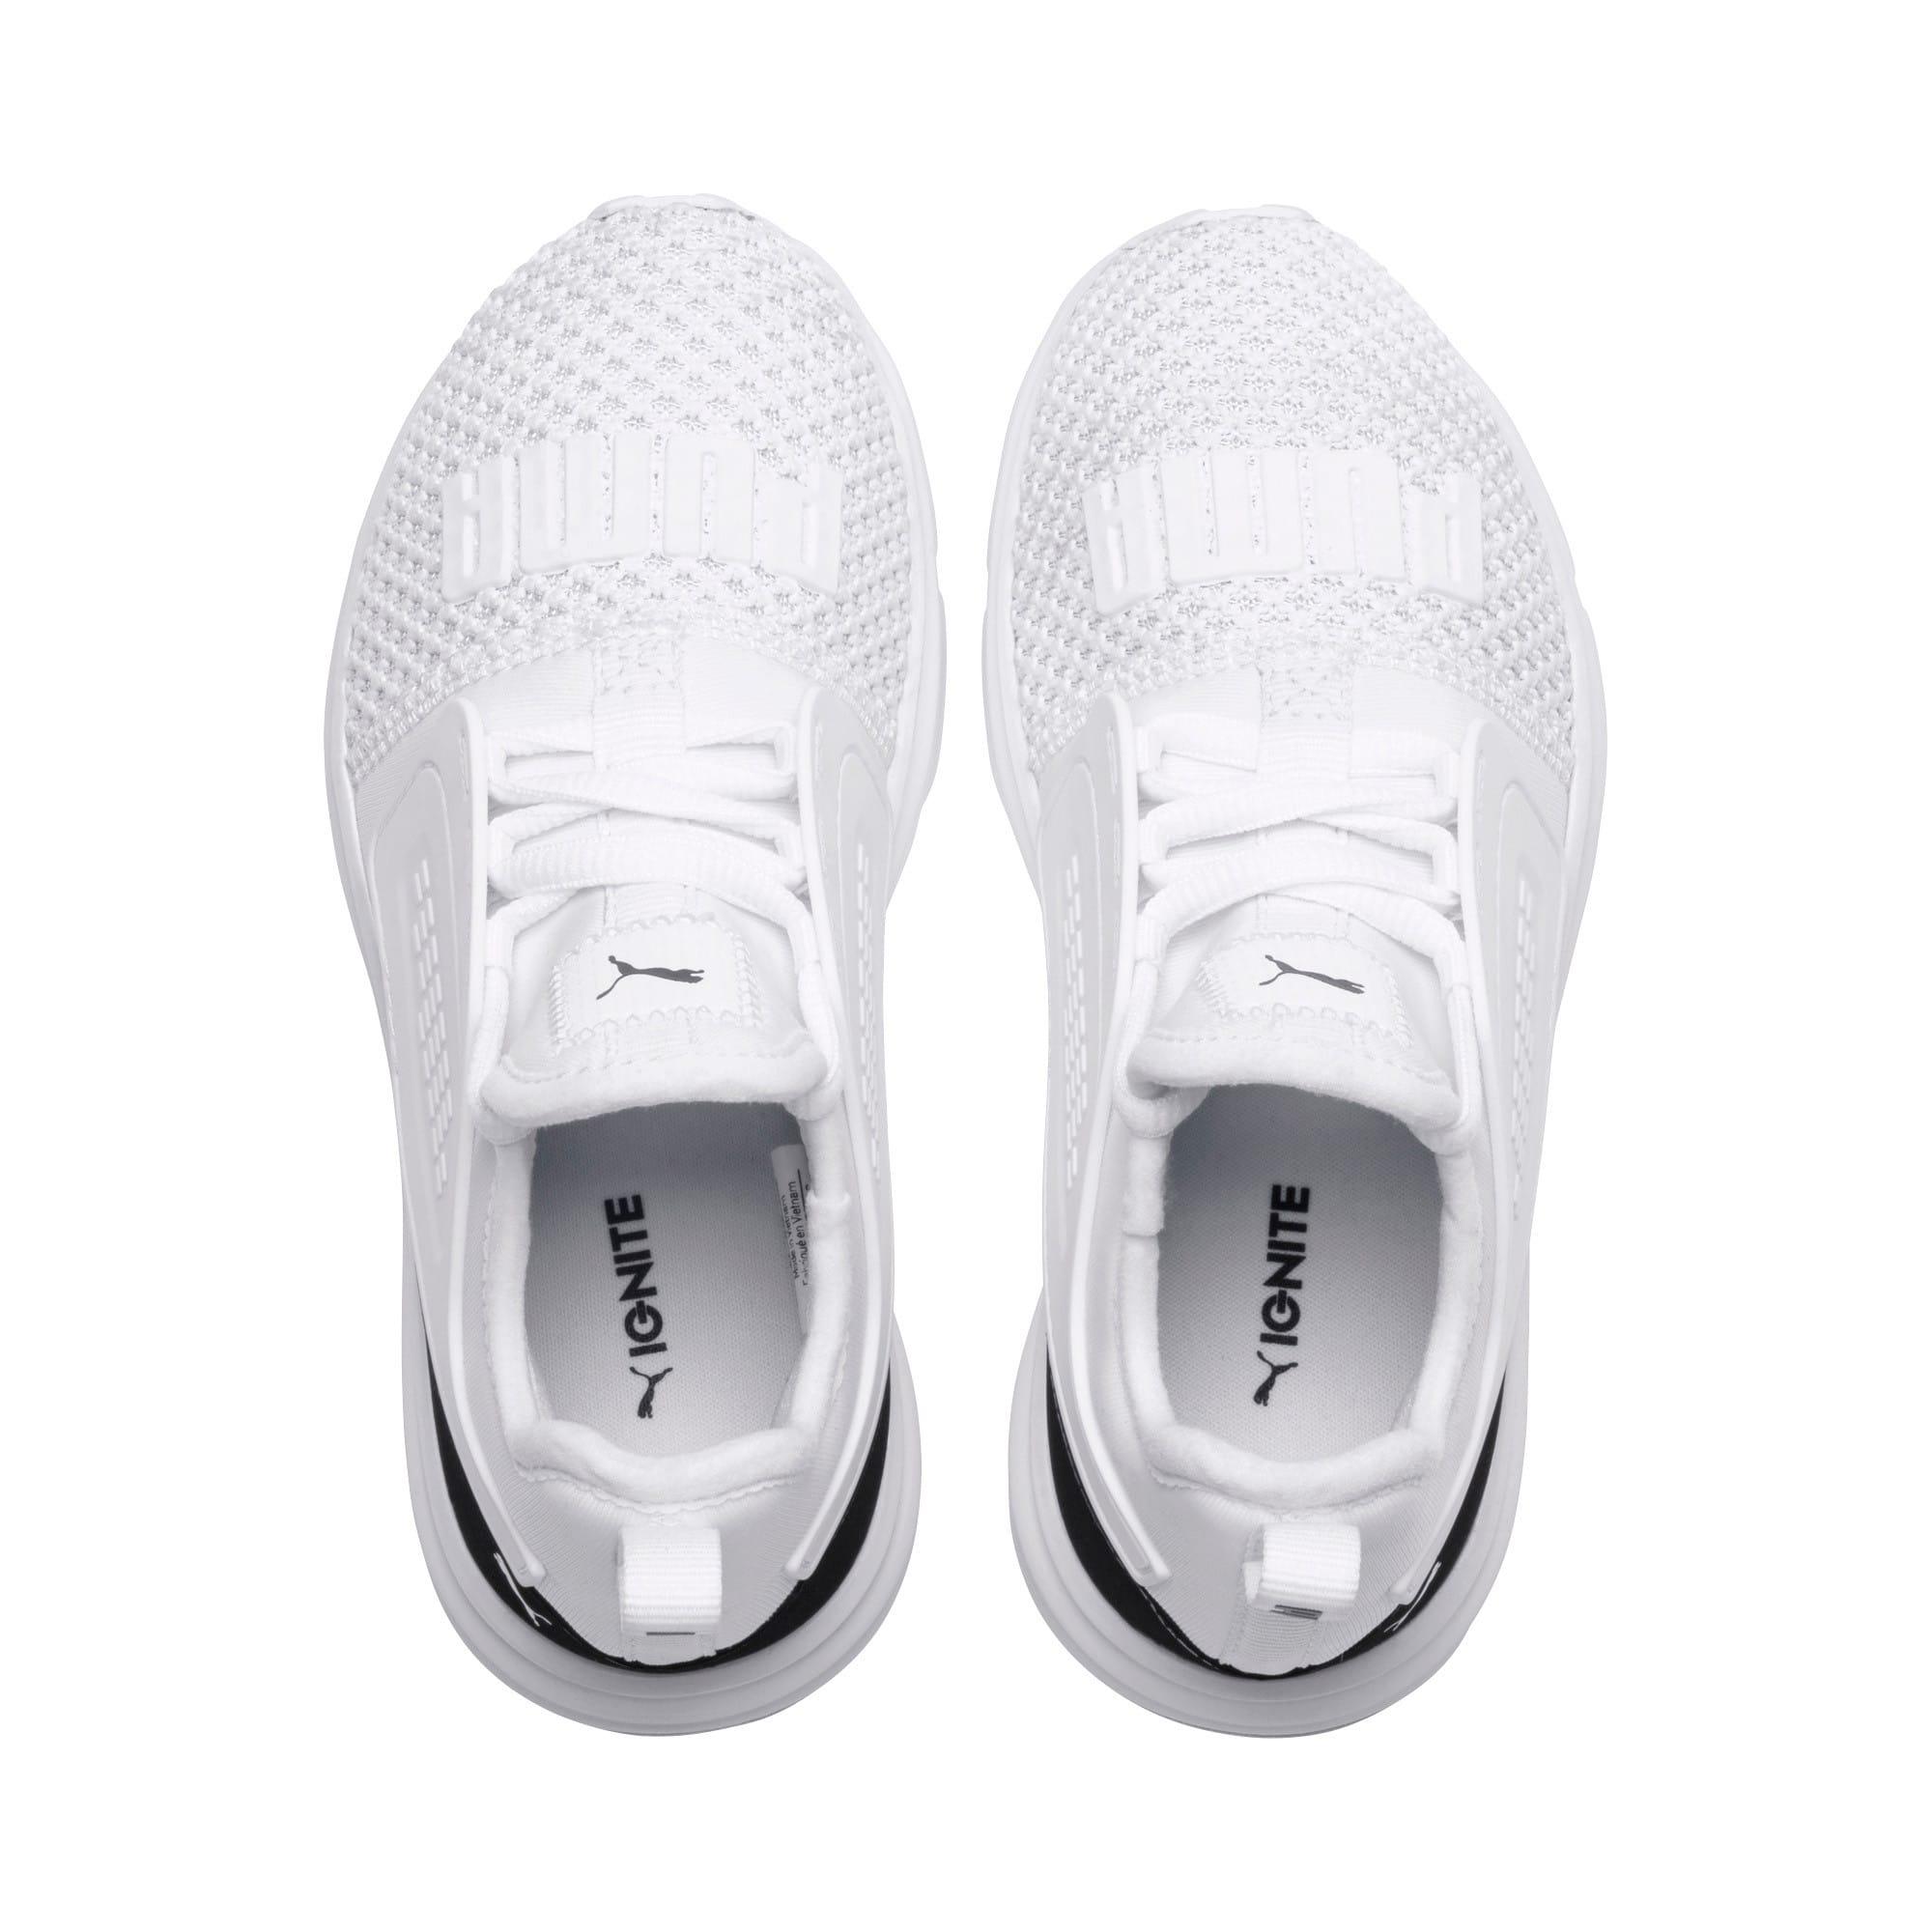 Thumbnail 6 of IGNITE Limitless 2 AC Little Kids' Little Kids' Shoes, Puma White-Puma Black, medium